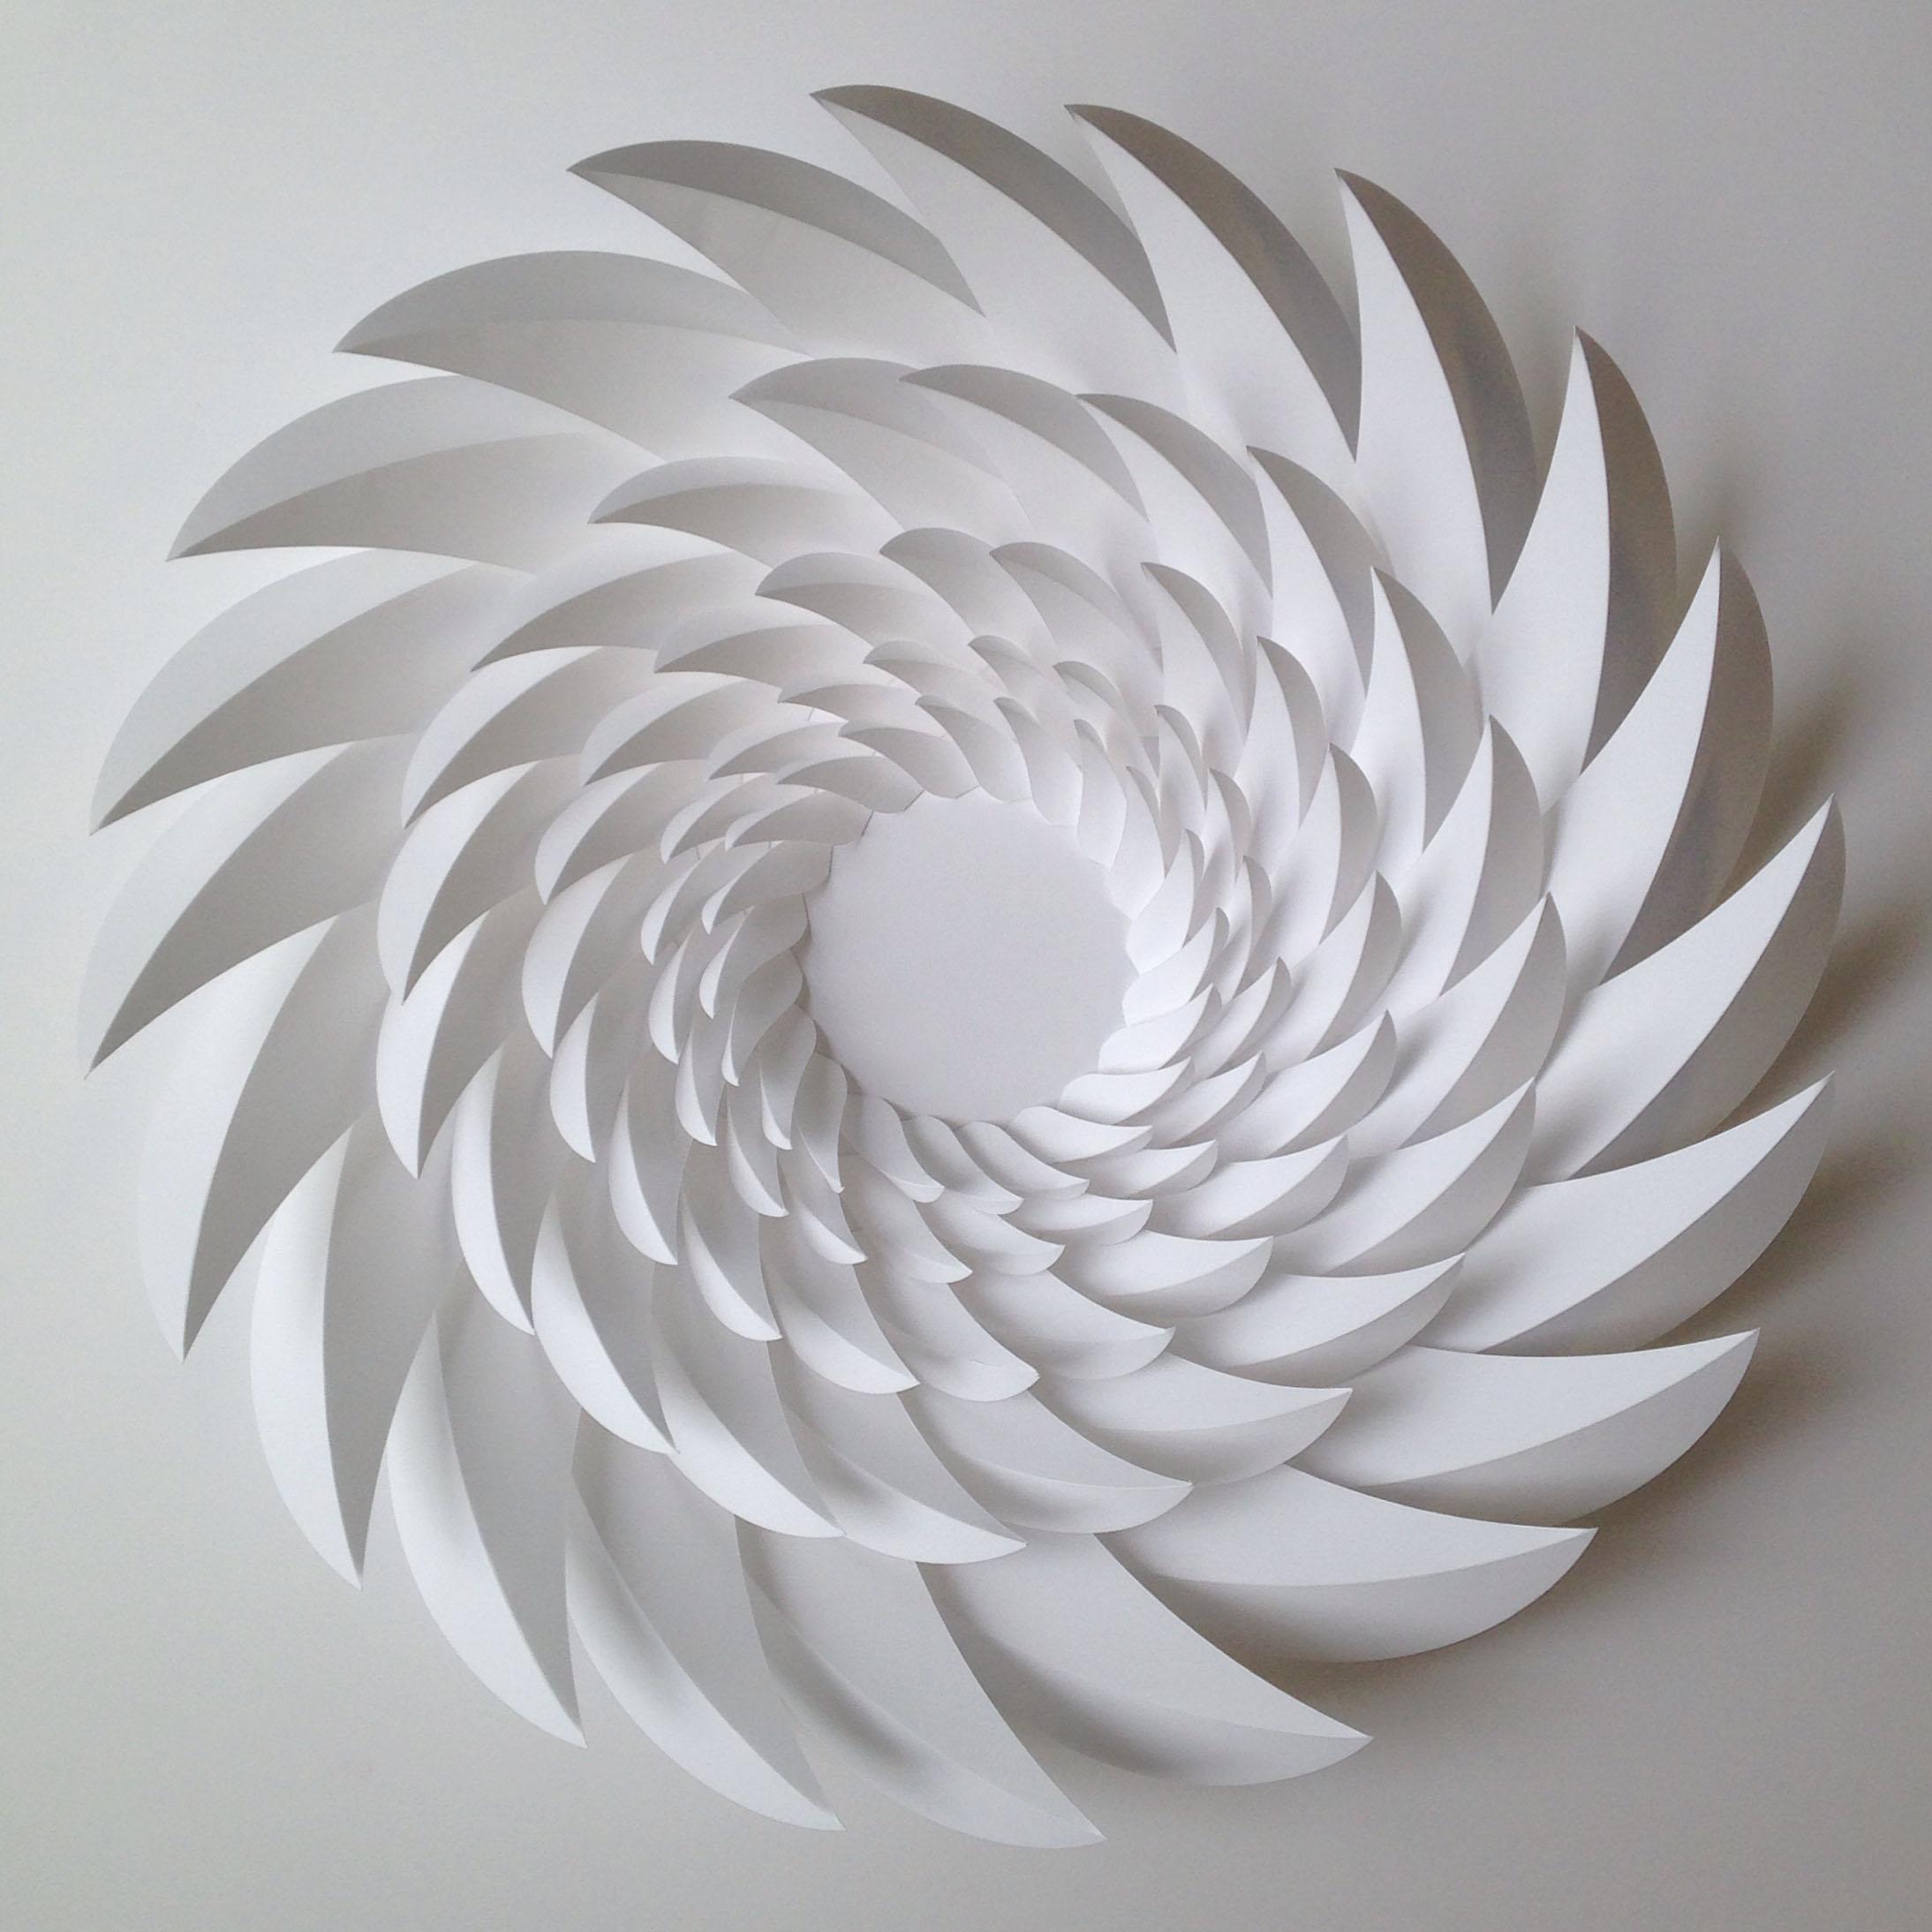 "Retina,  Cut and Folded Paper, 22.5"" x 22.5"" x 5"""